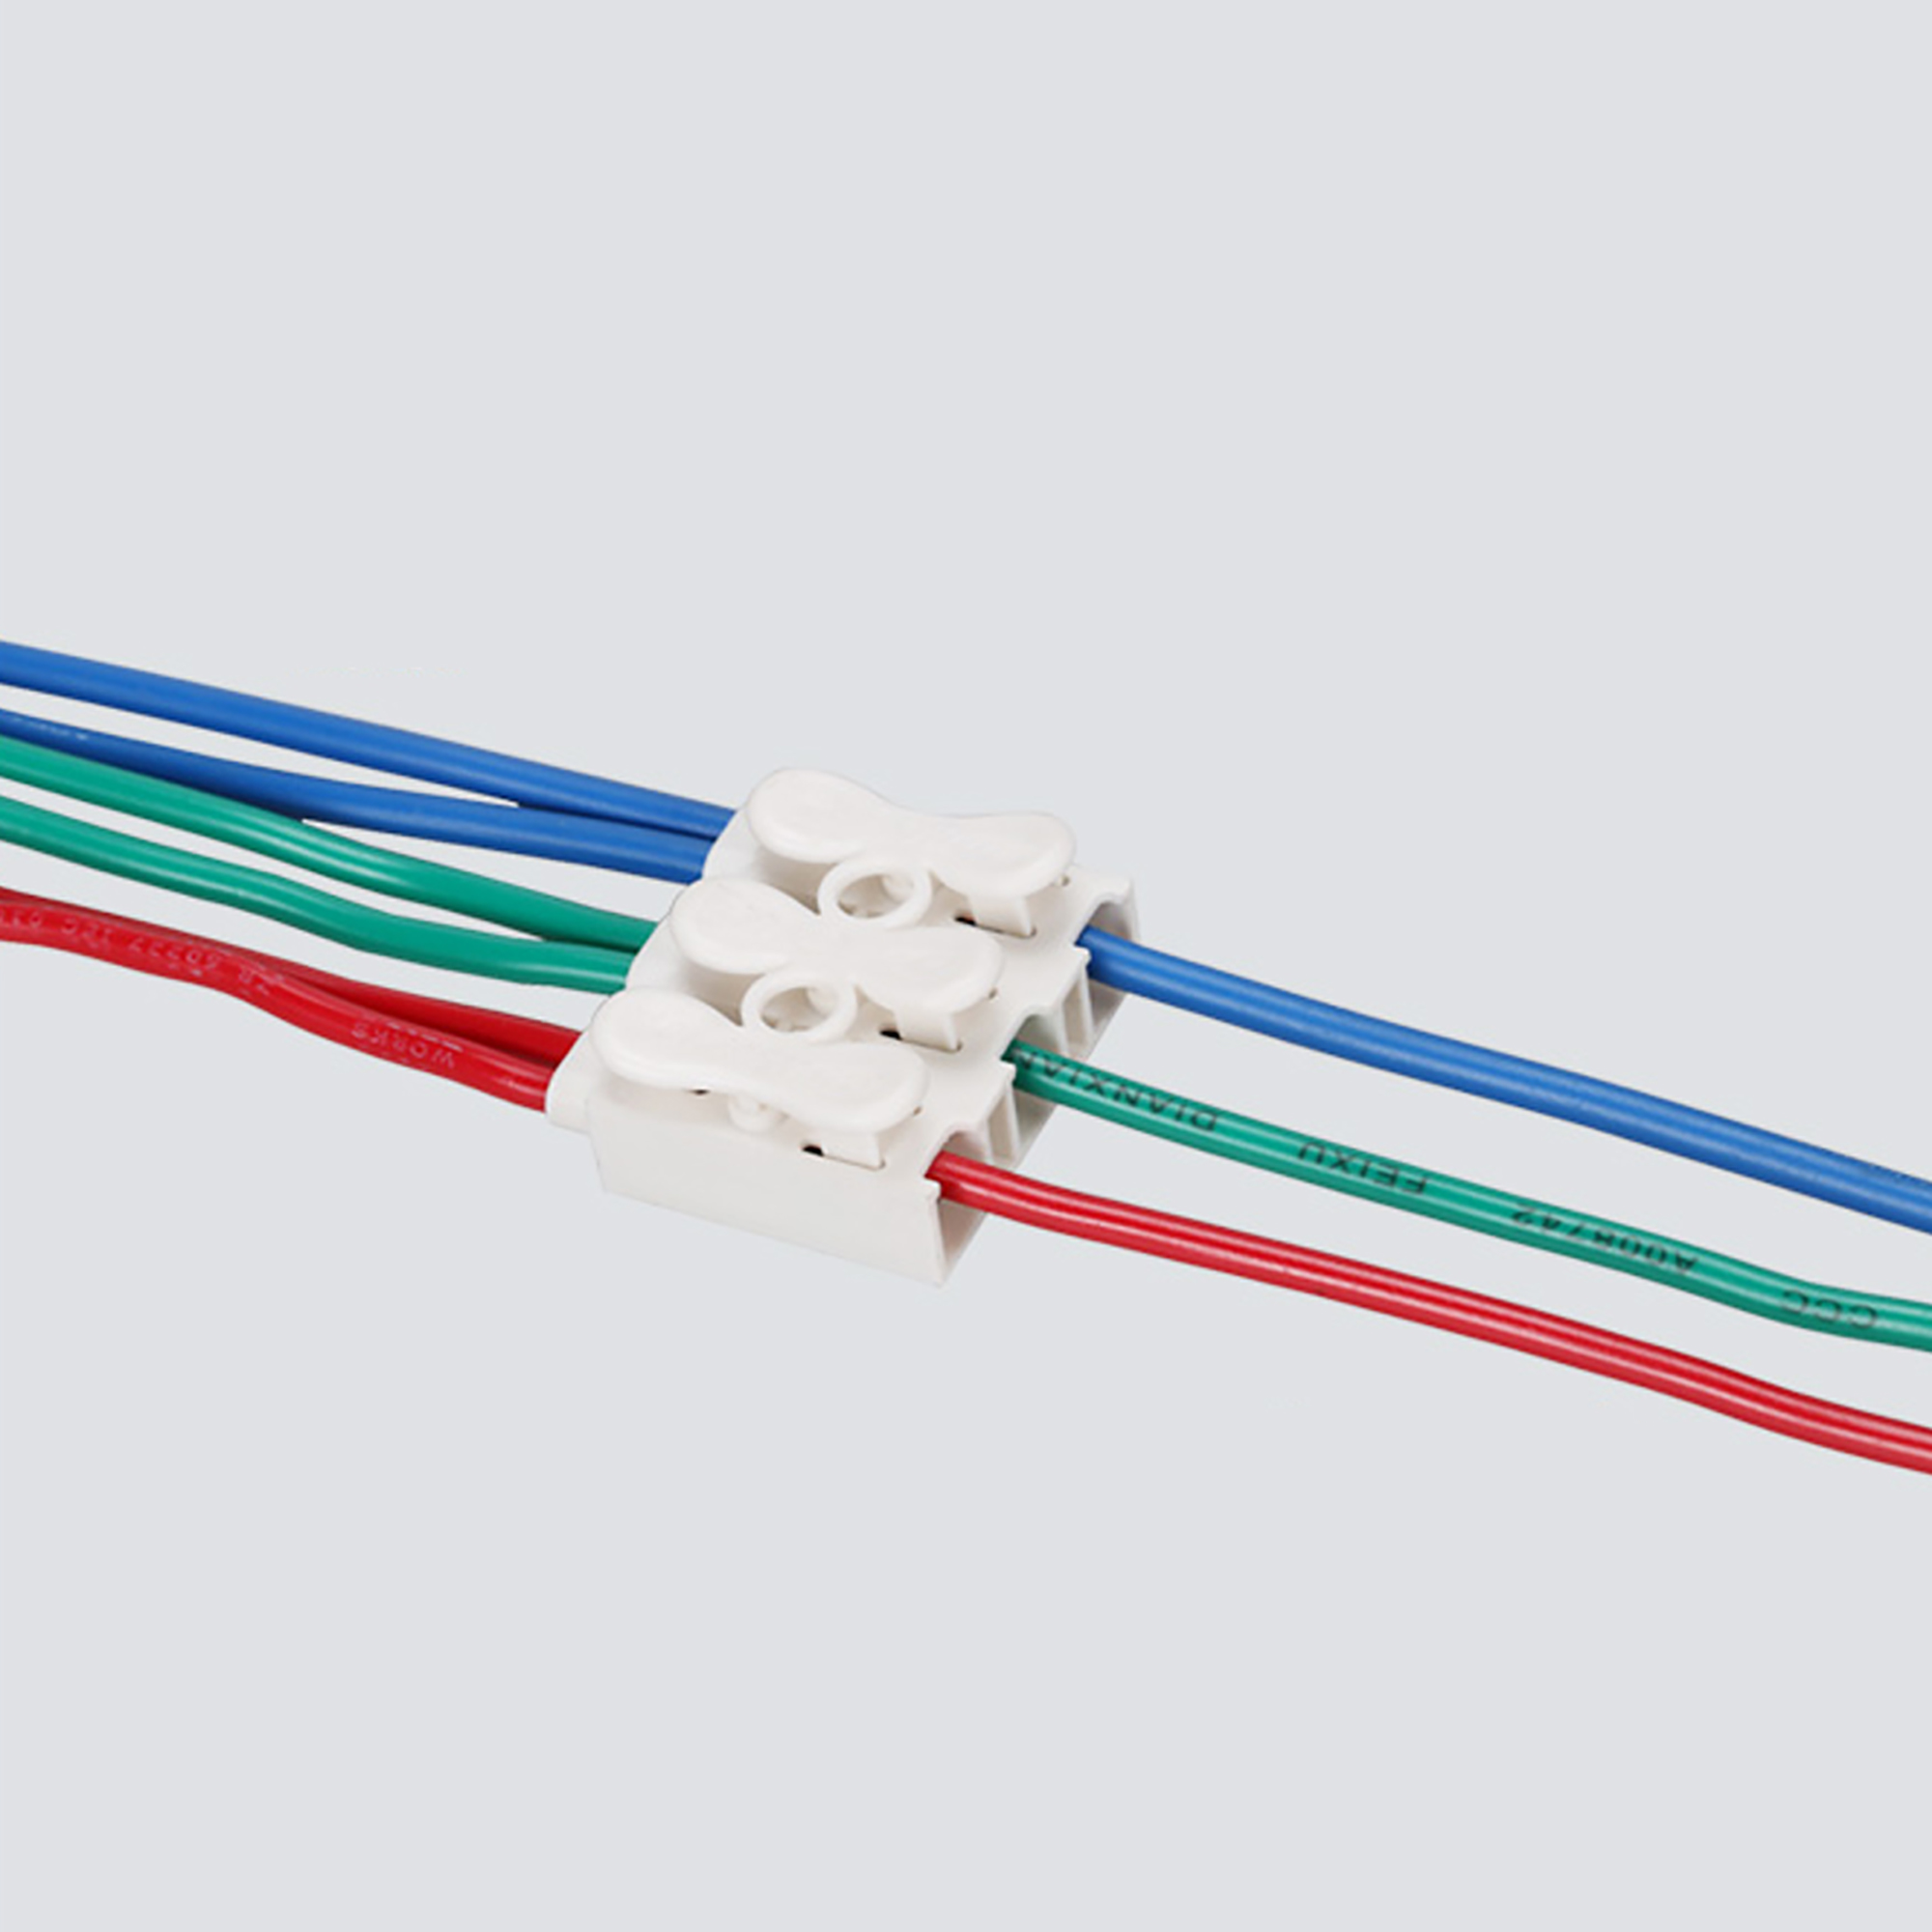 Spring Wire Connectors Quick Connector Press Type Terminal Block 3 Positions 100pcs - image 4 de 5